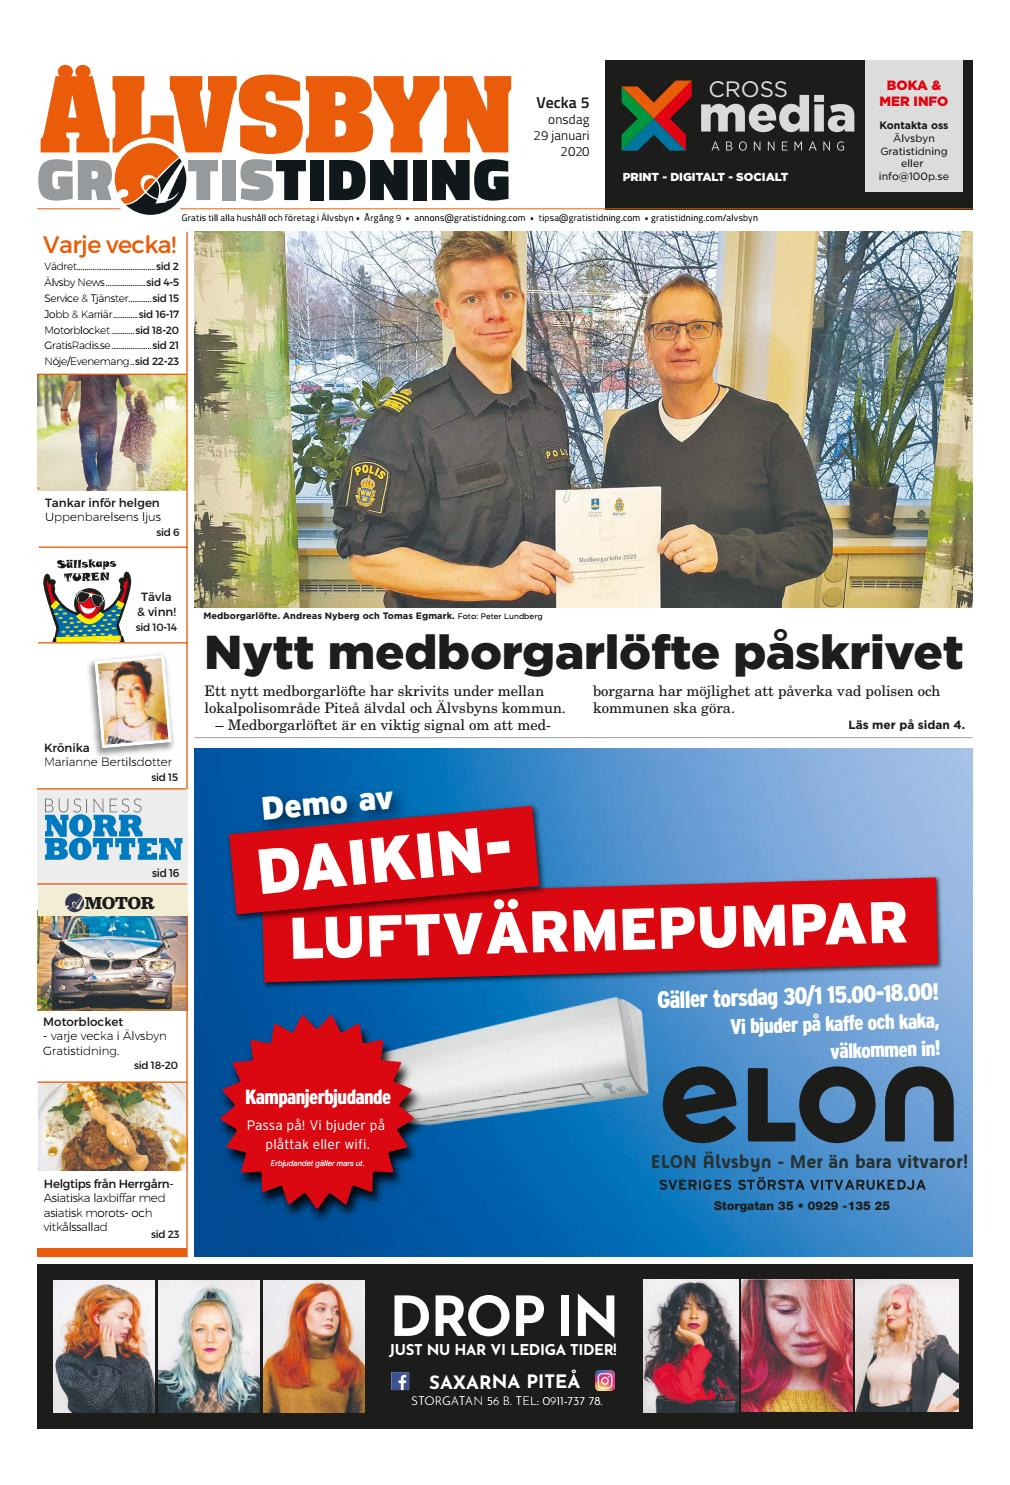 Alexander, Man, 24 | lvsbyn, Sverige | Badoo